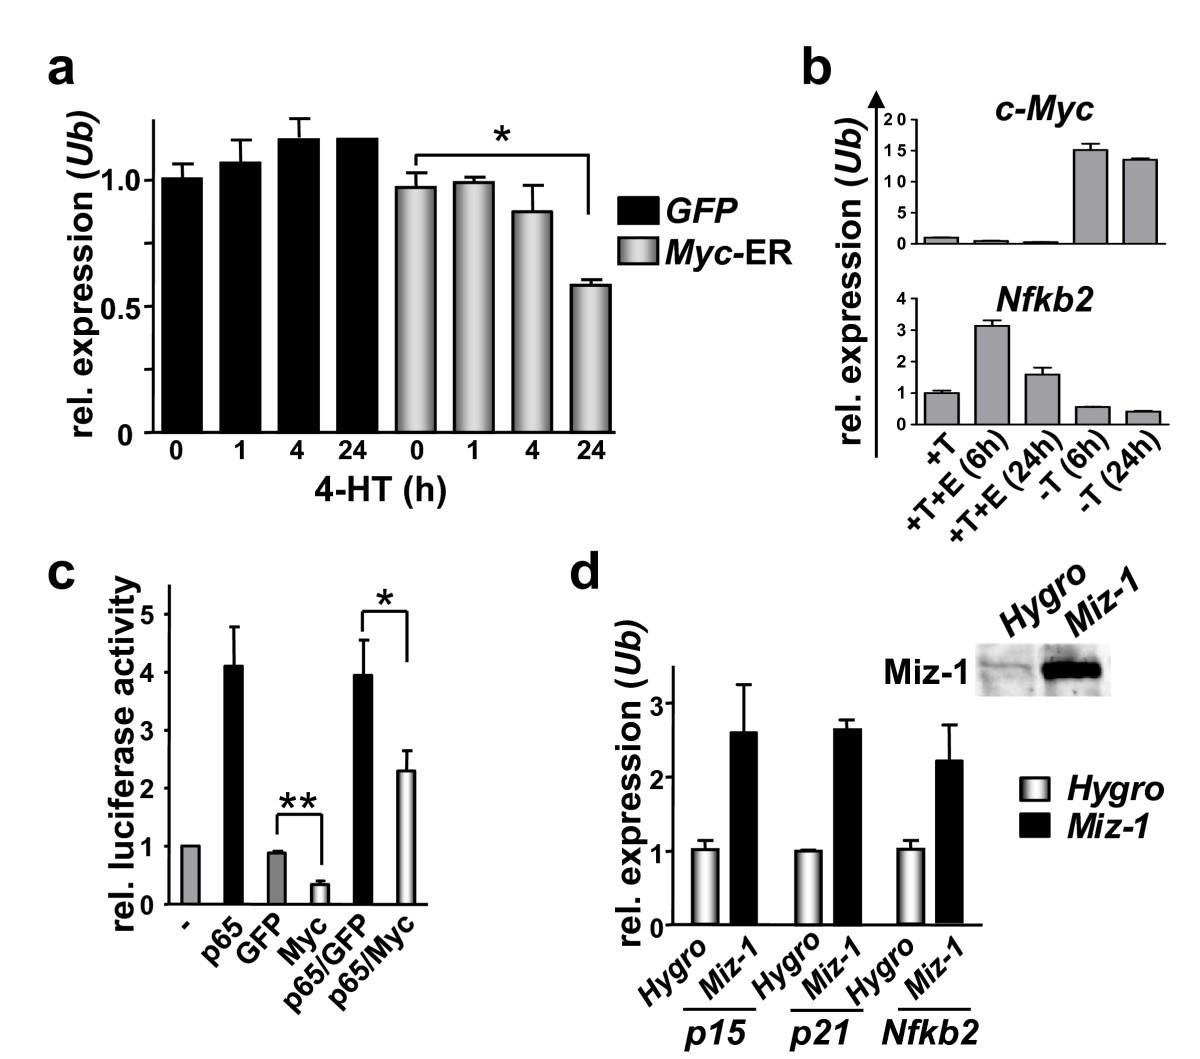 myc suppression of nfkb2 accelerates lymphomagenesis